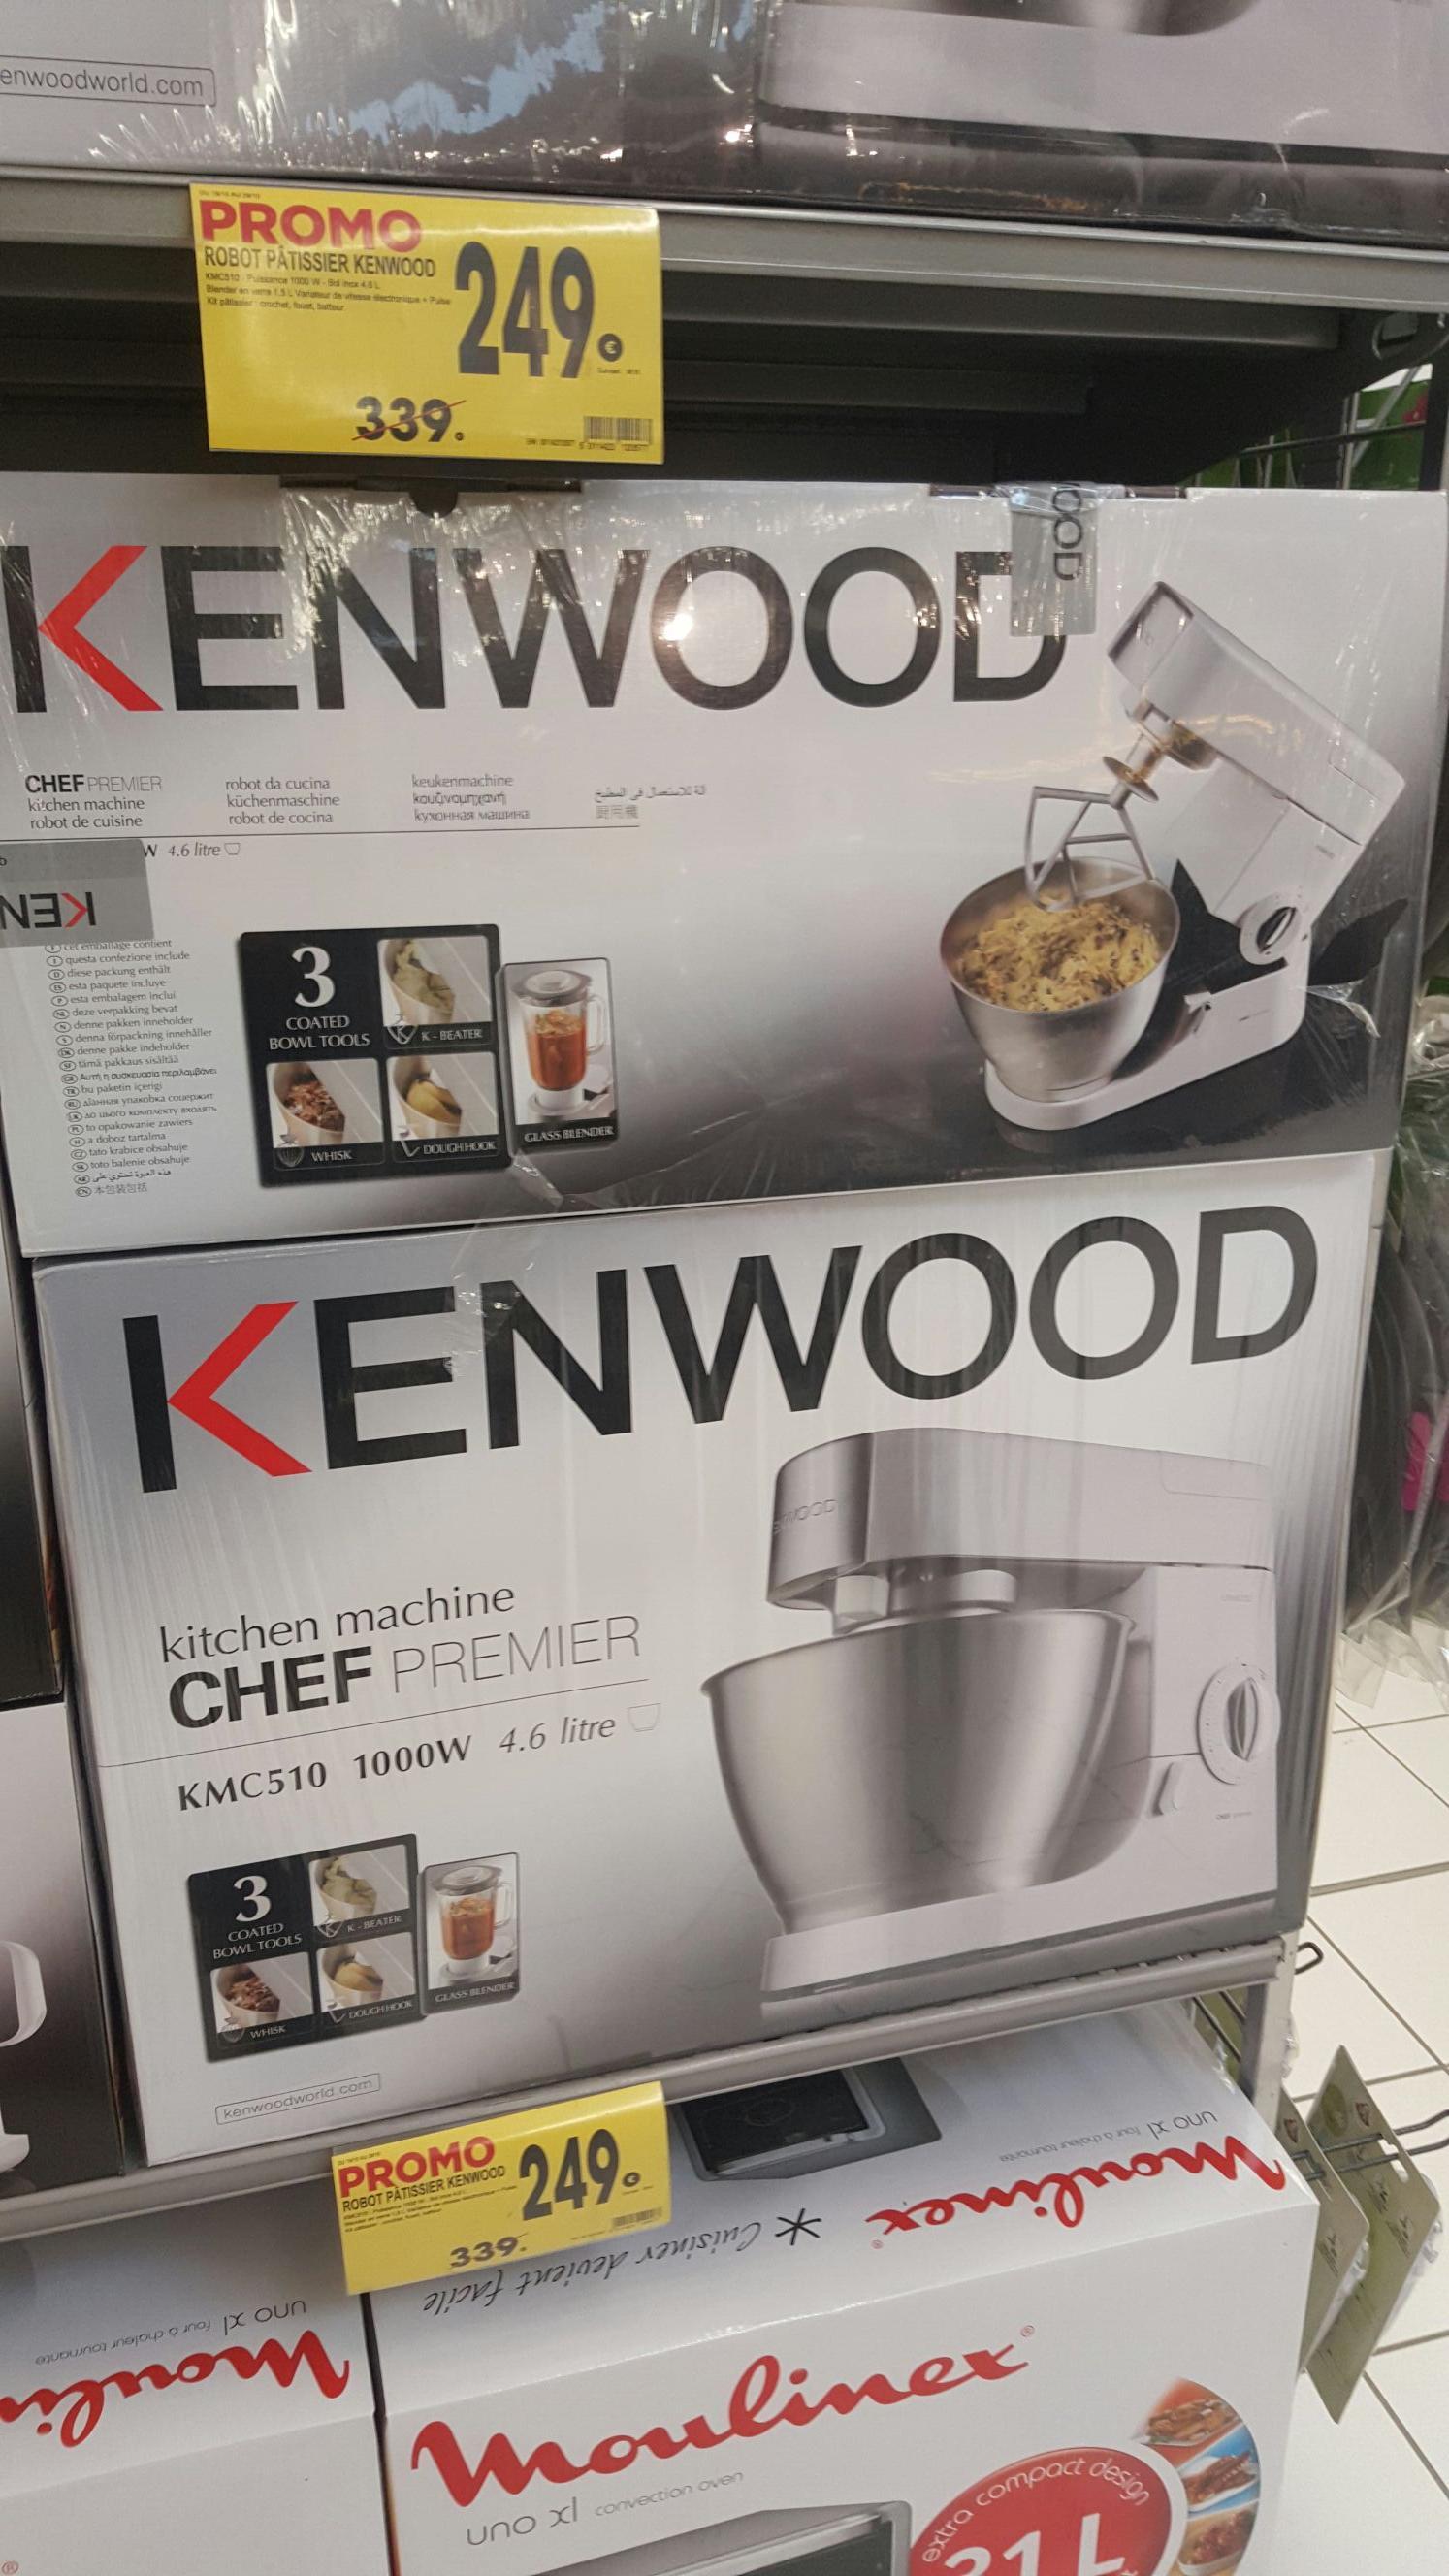 Robot patissier Kenwood premier chef